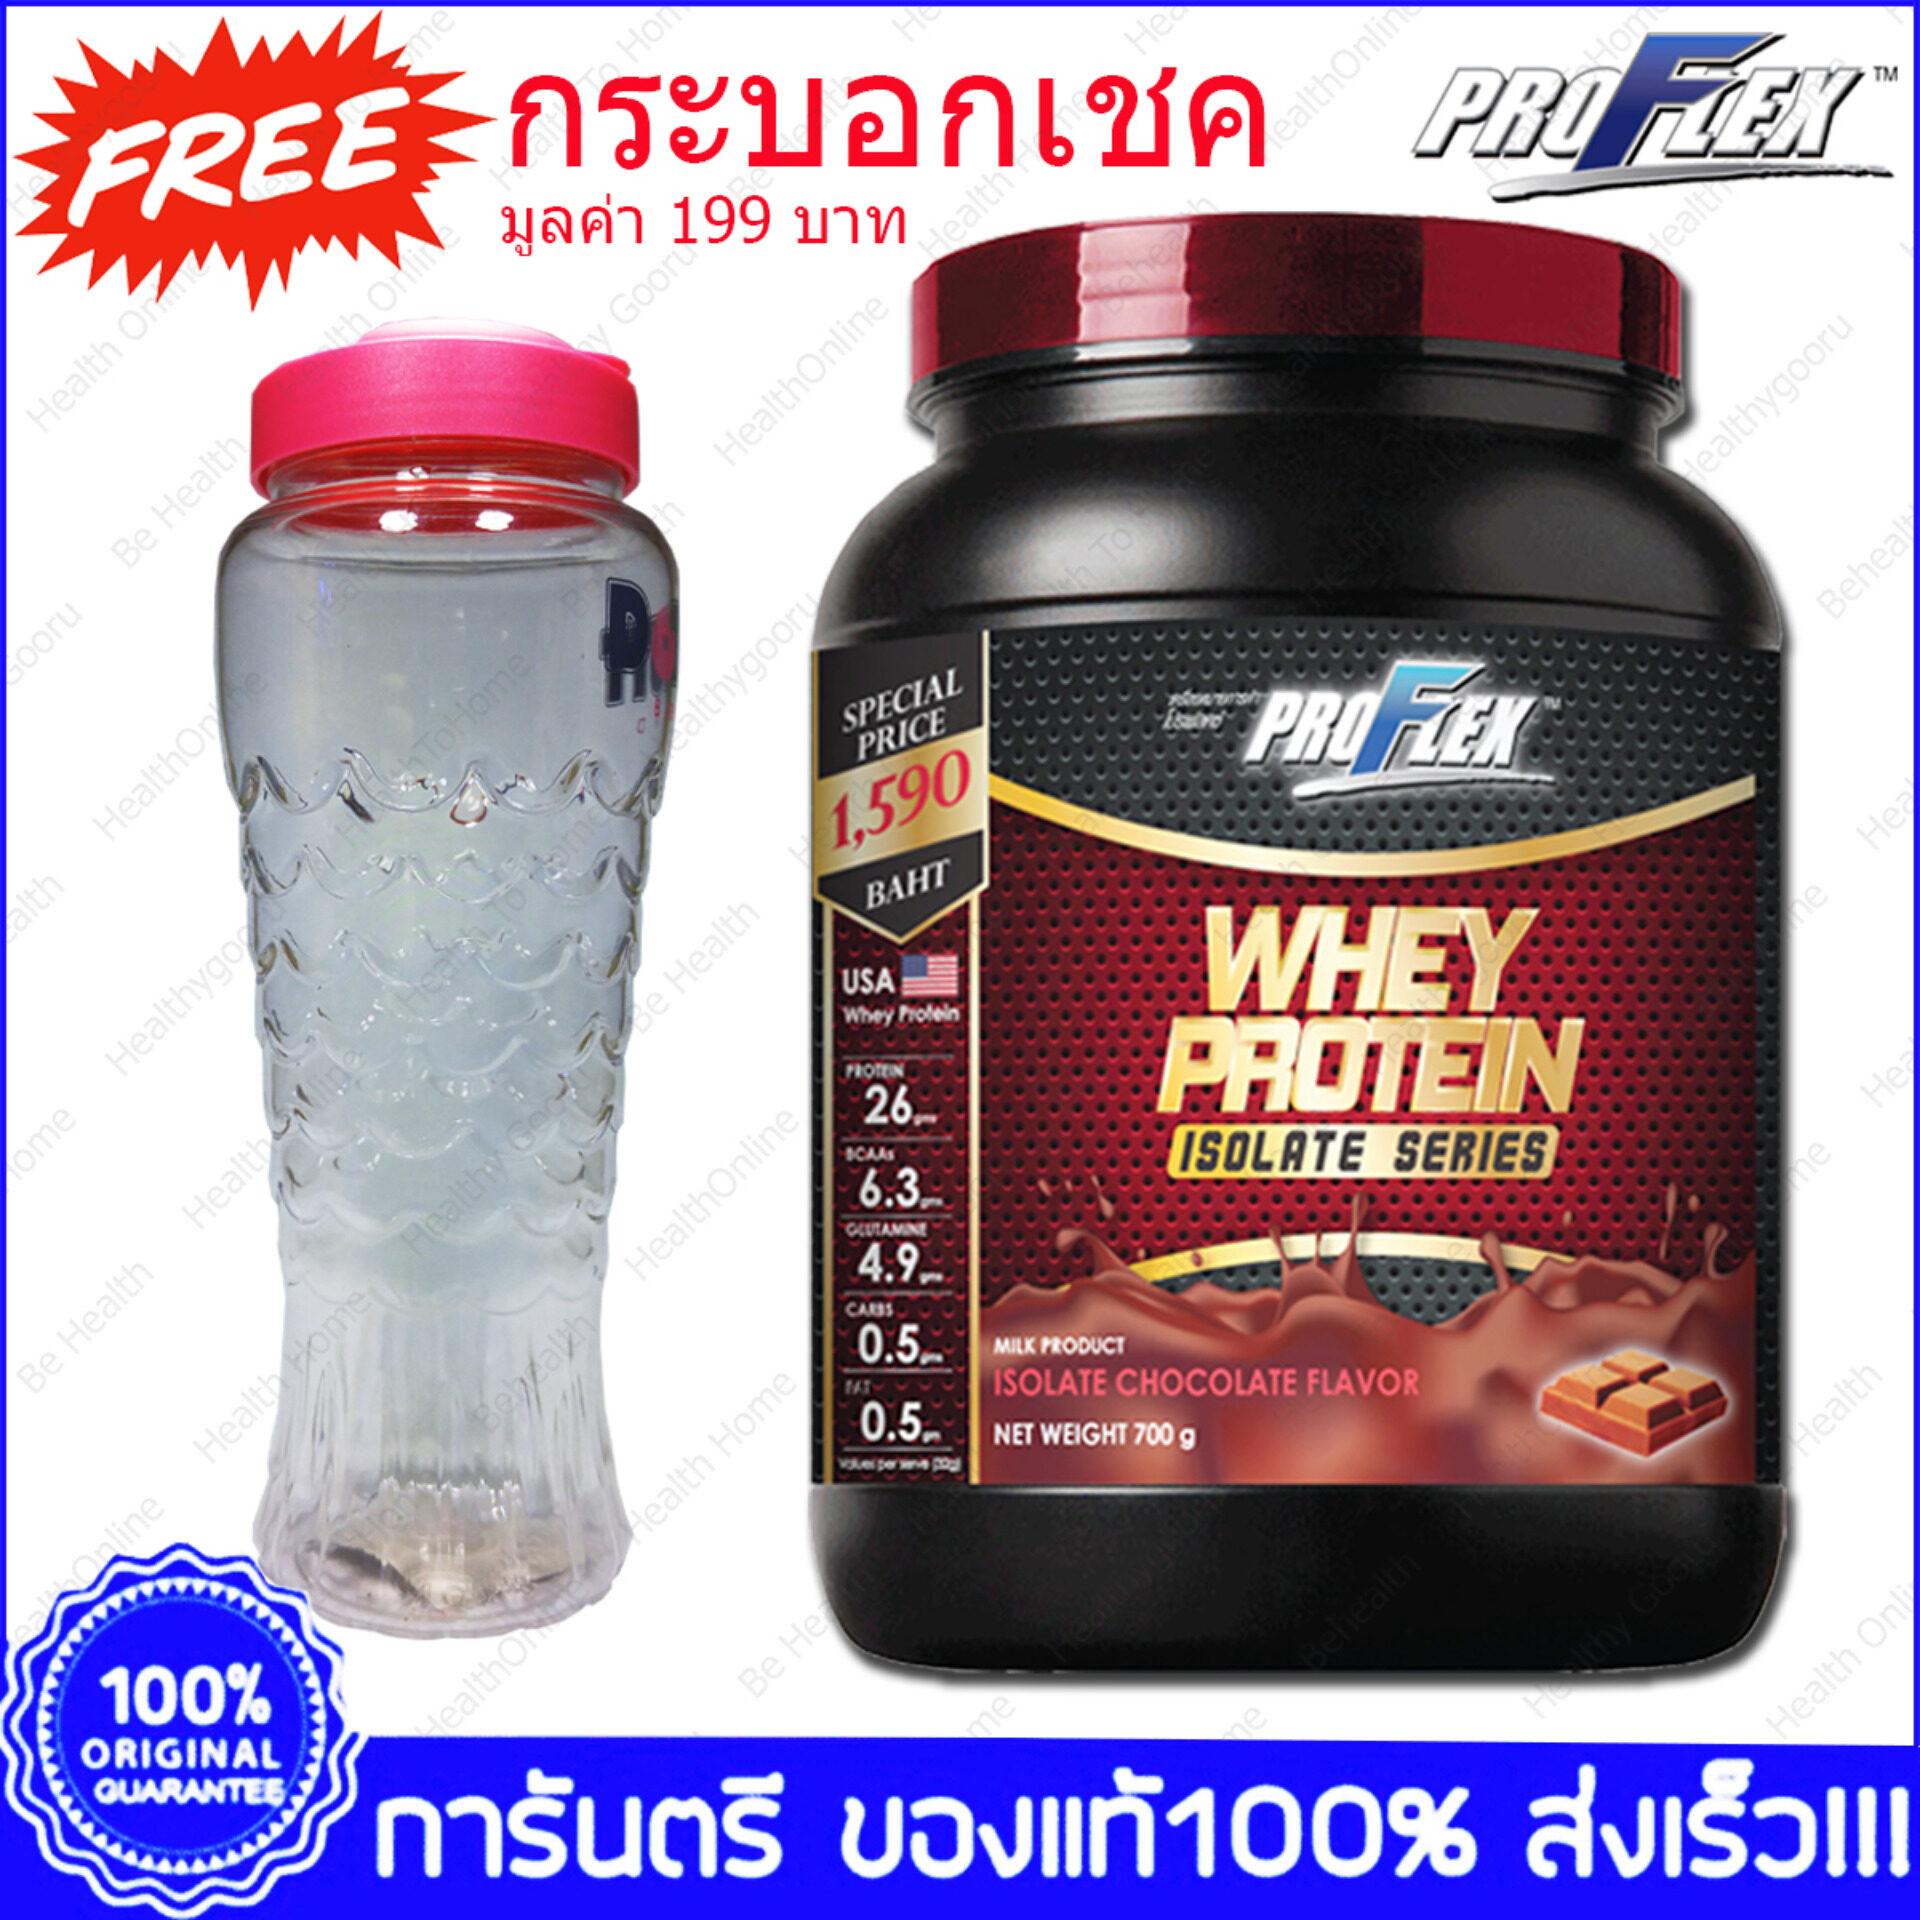 ProFlex Isolate Chocolate 700g. X 1 Bottle + Free! Shaker (199฿)